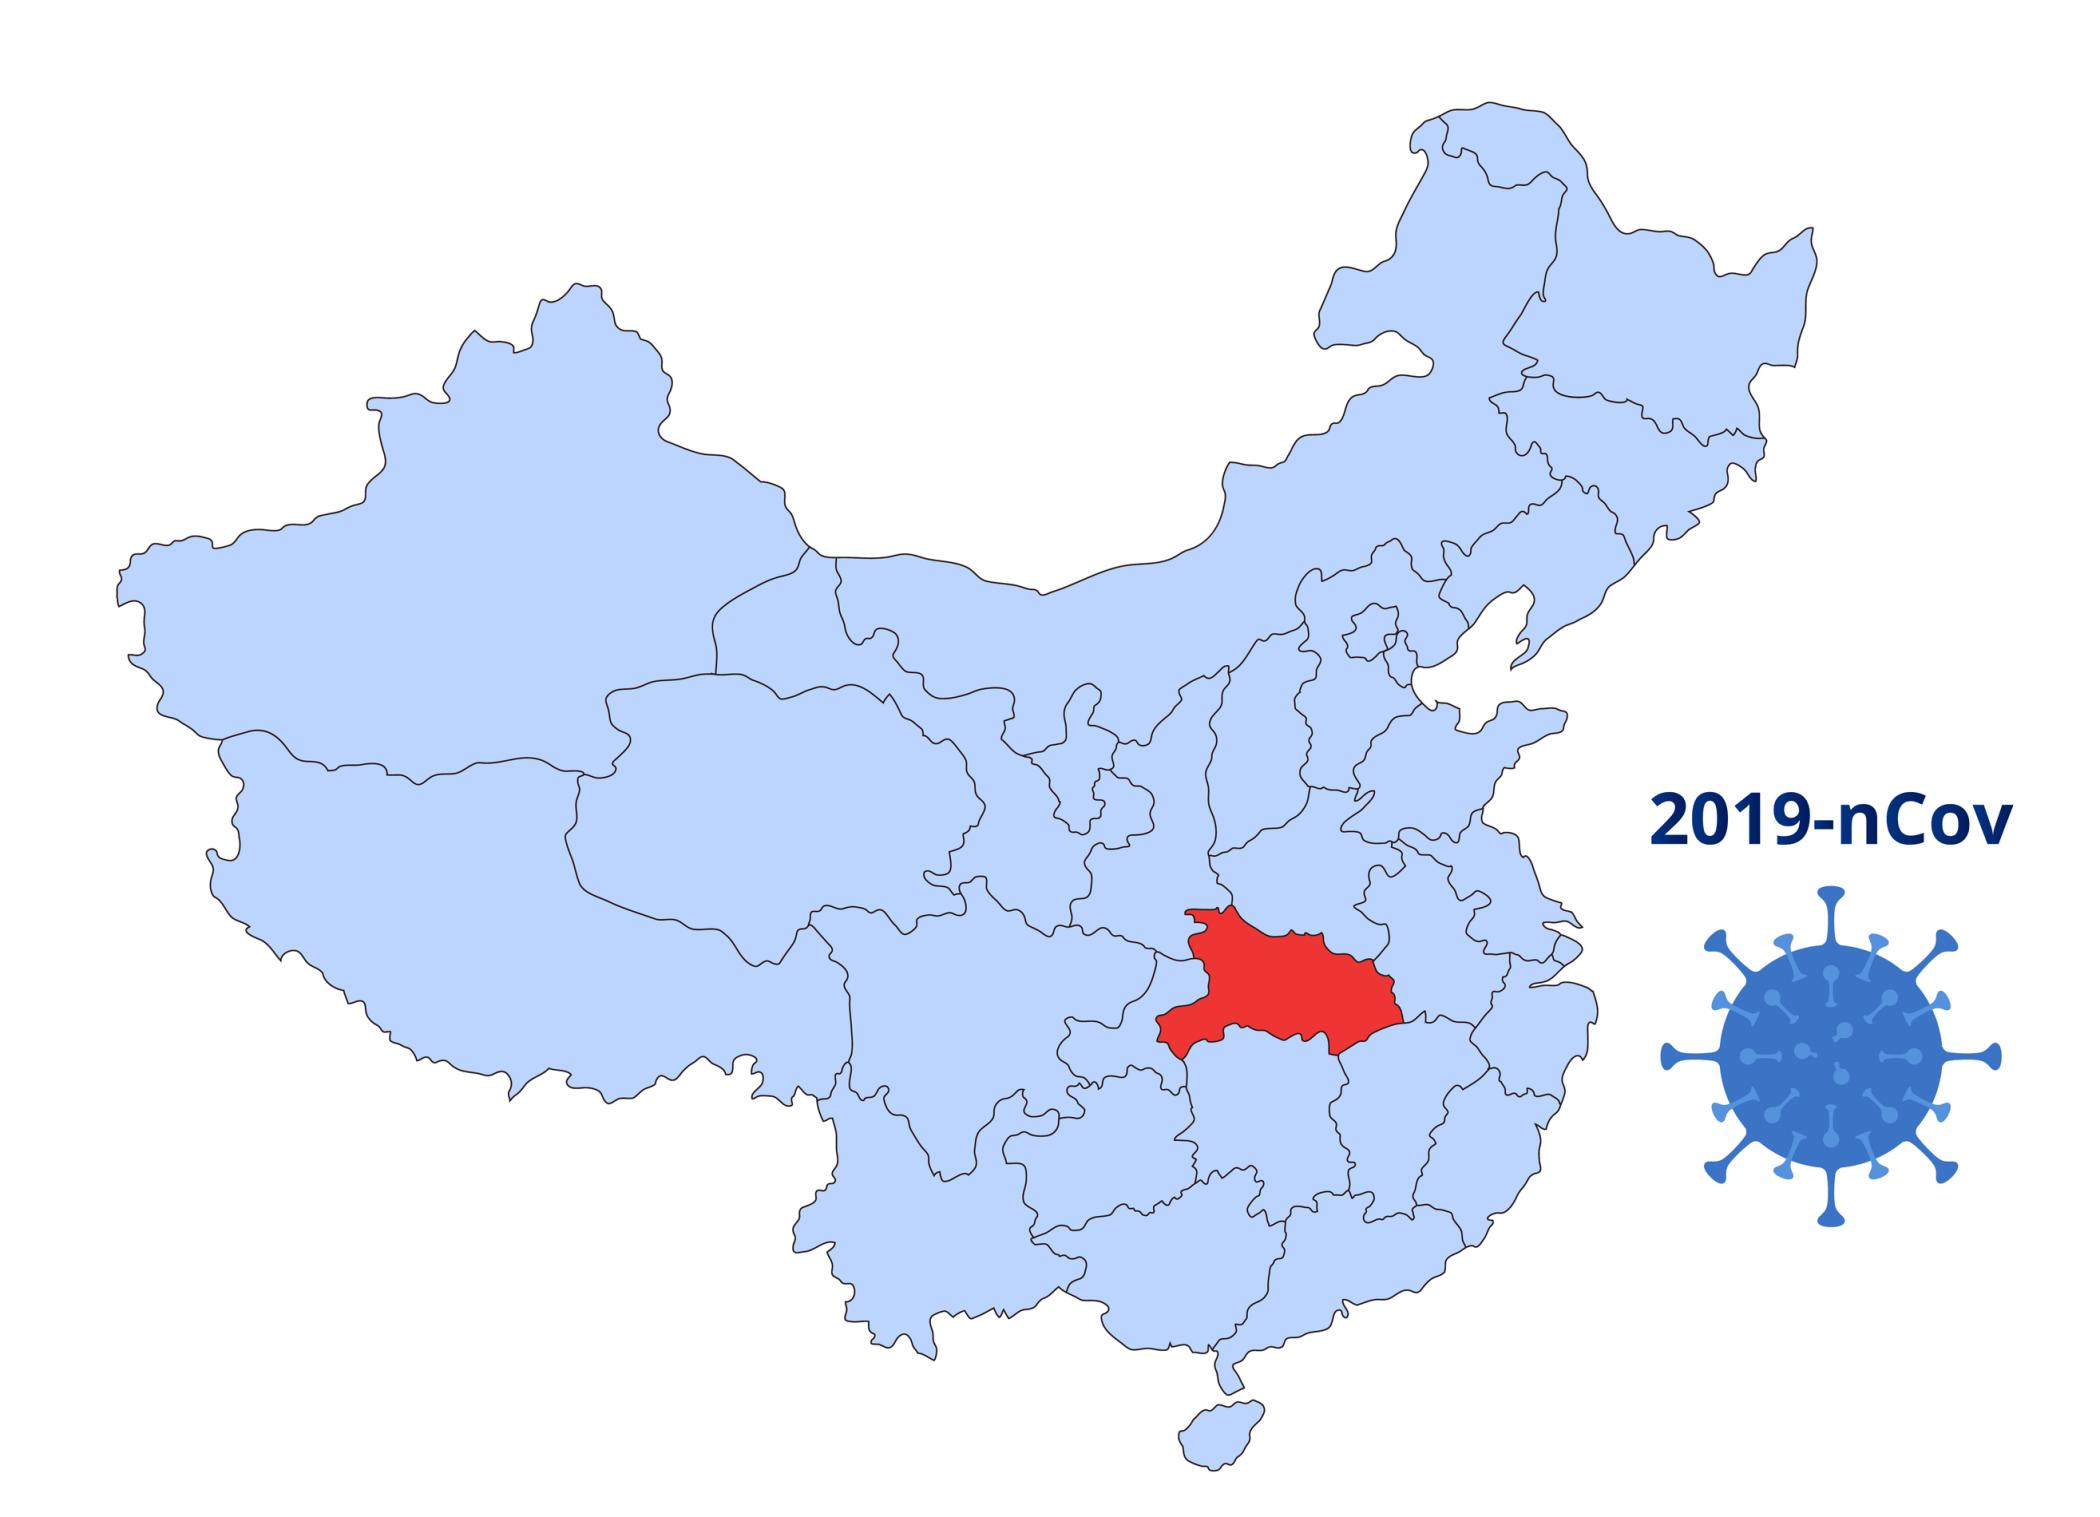 Pandemic Response in China